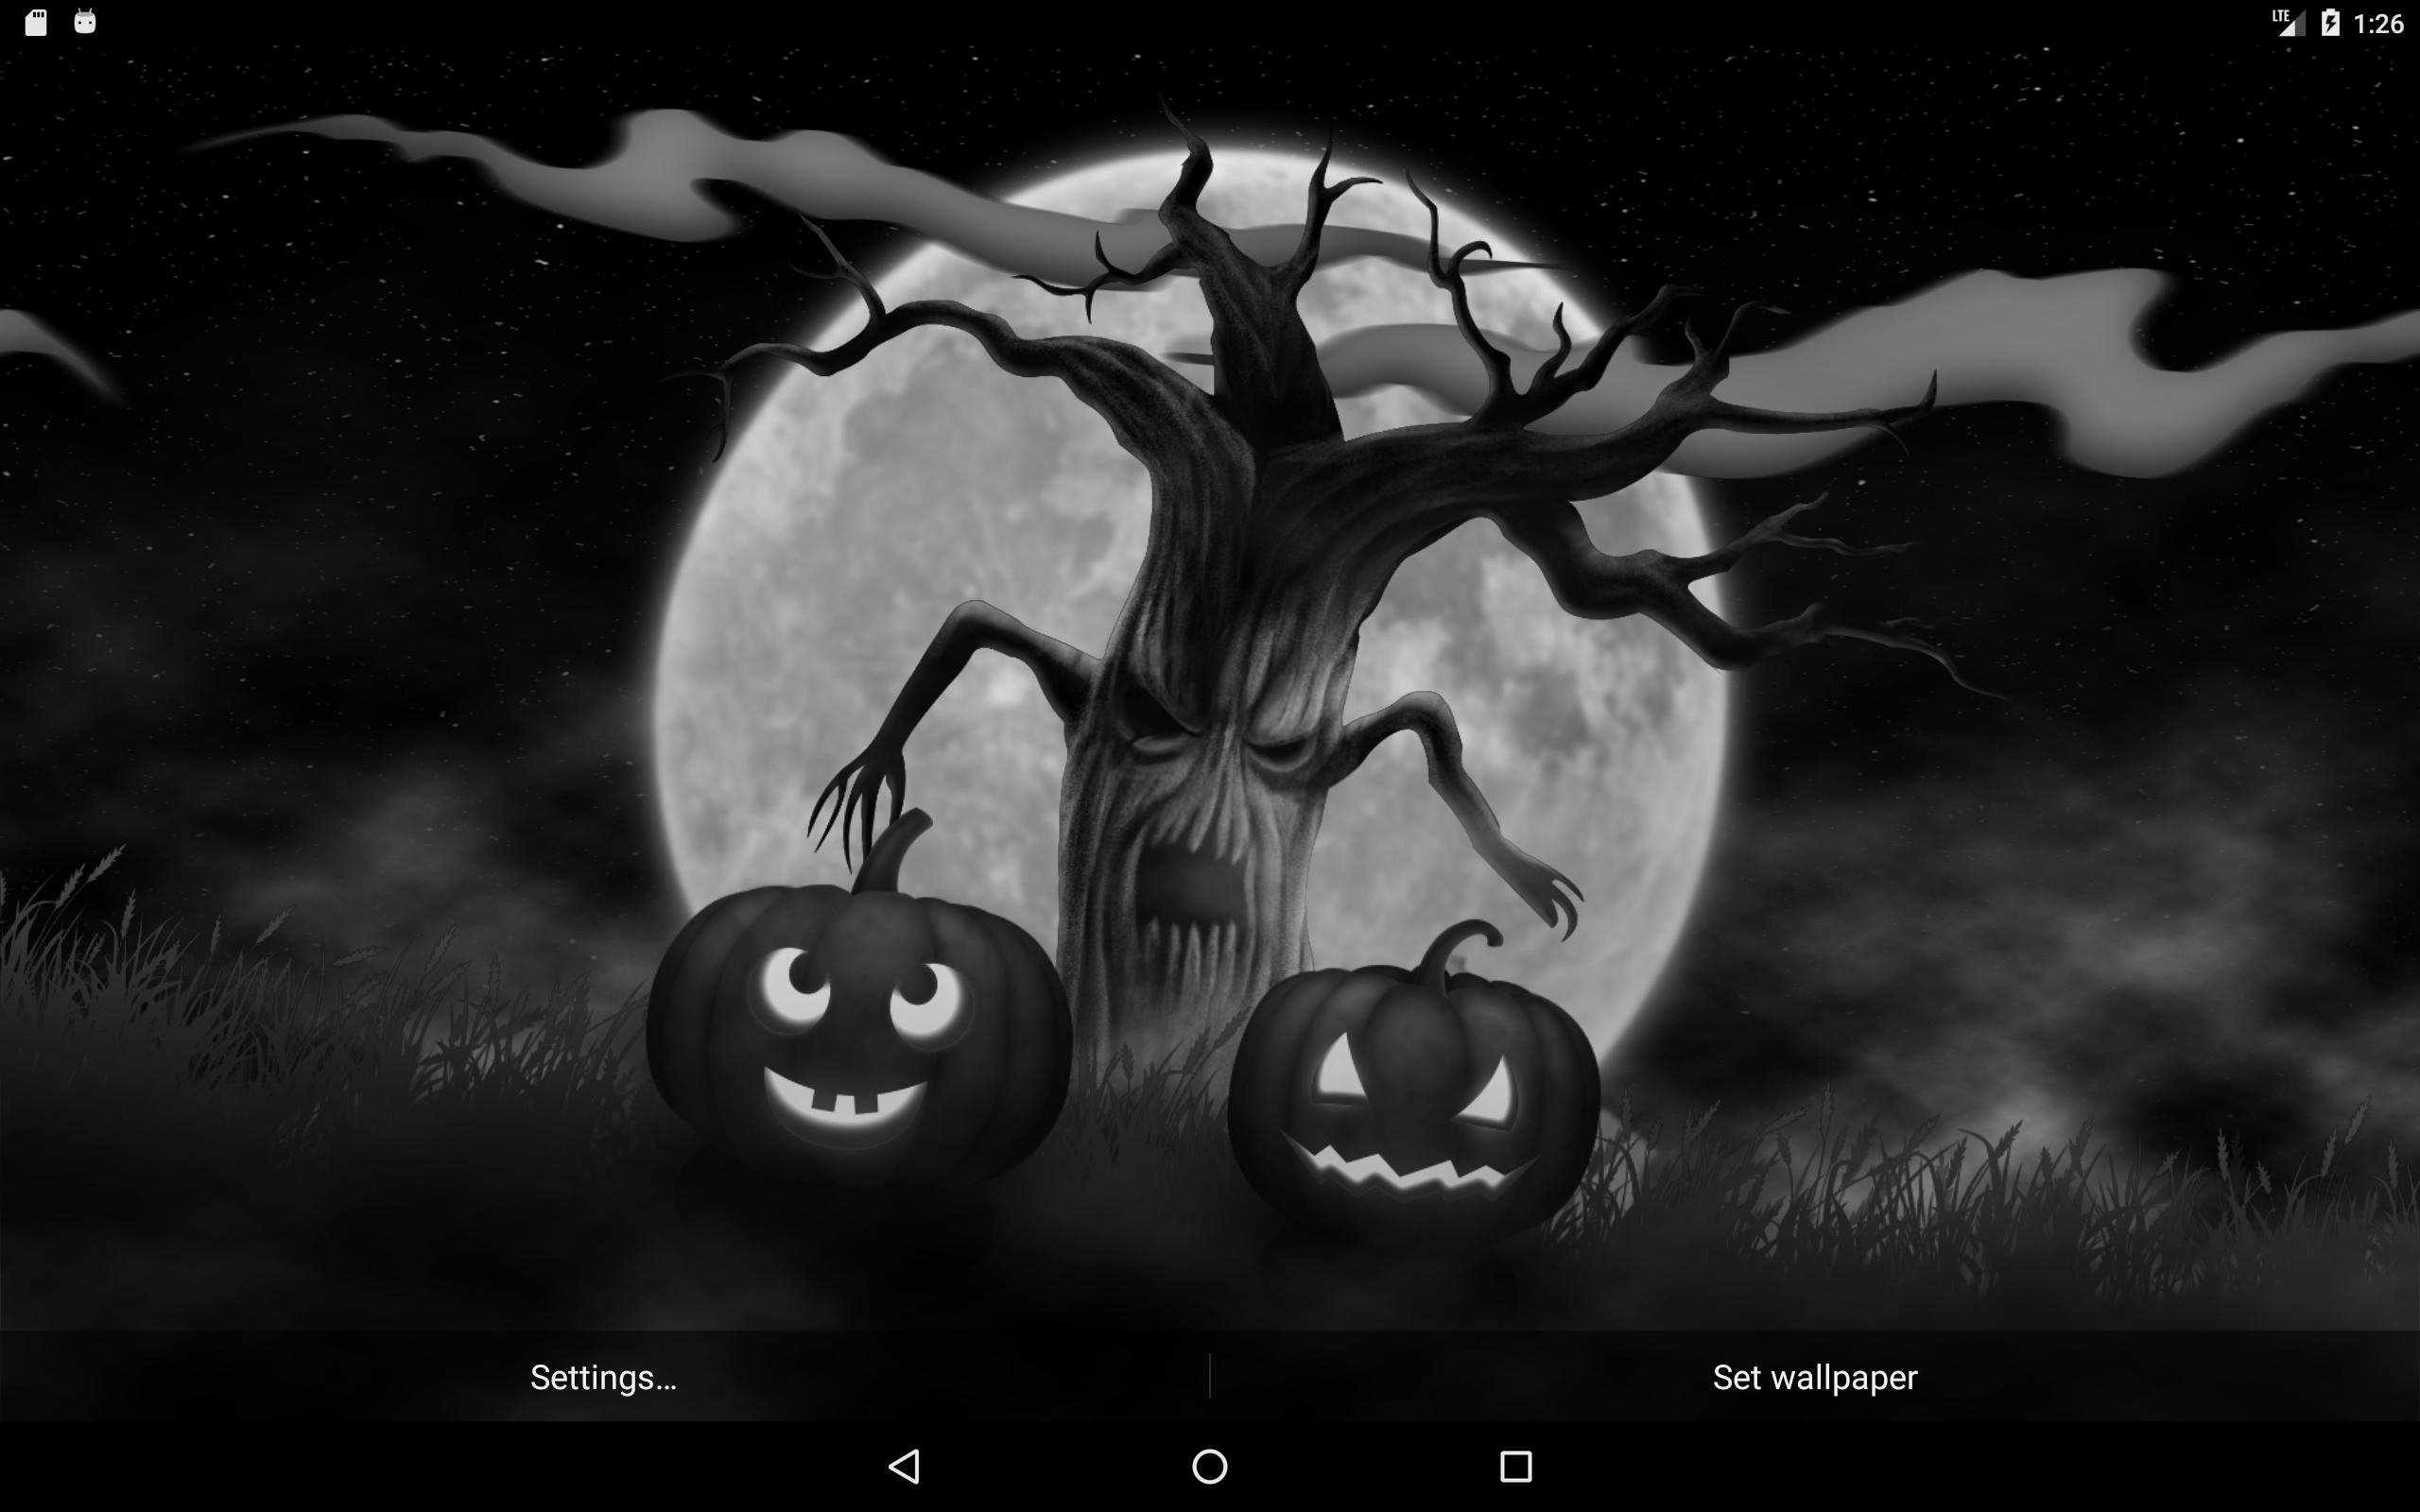 Halloween Spooky Wallpaper.Spooky Halloween Tree Live Wallpaper For Android Apk Download